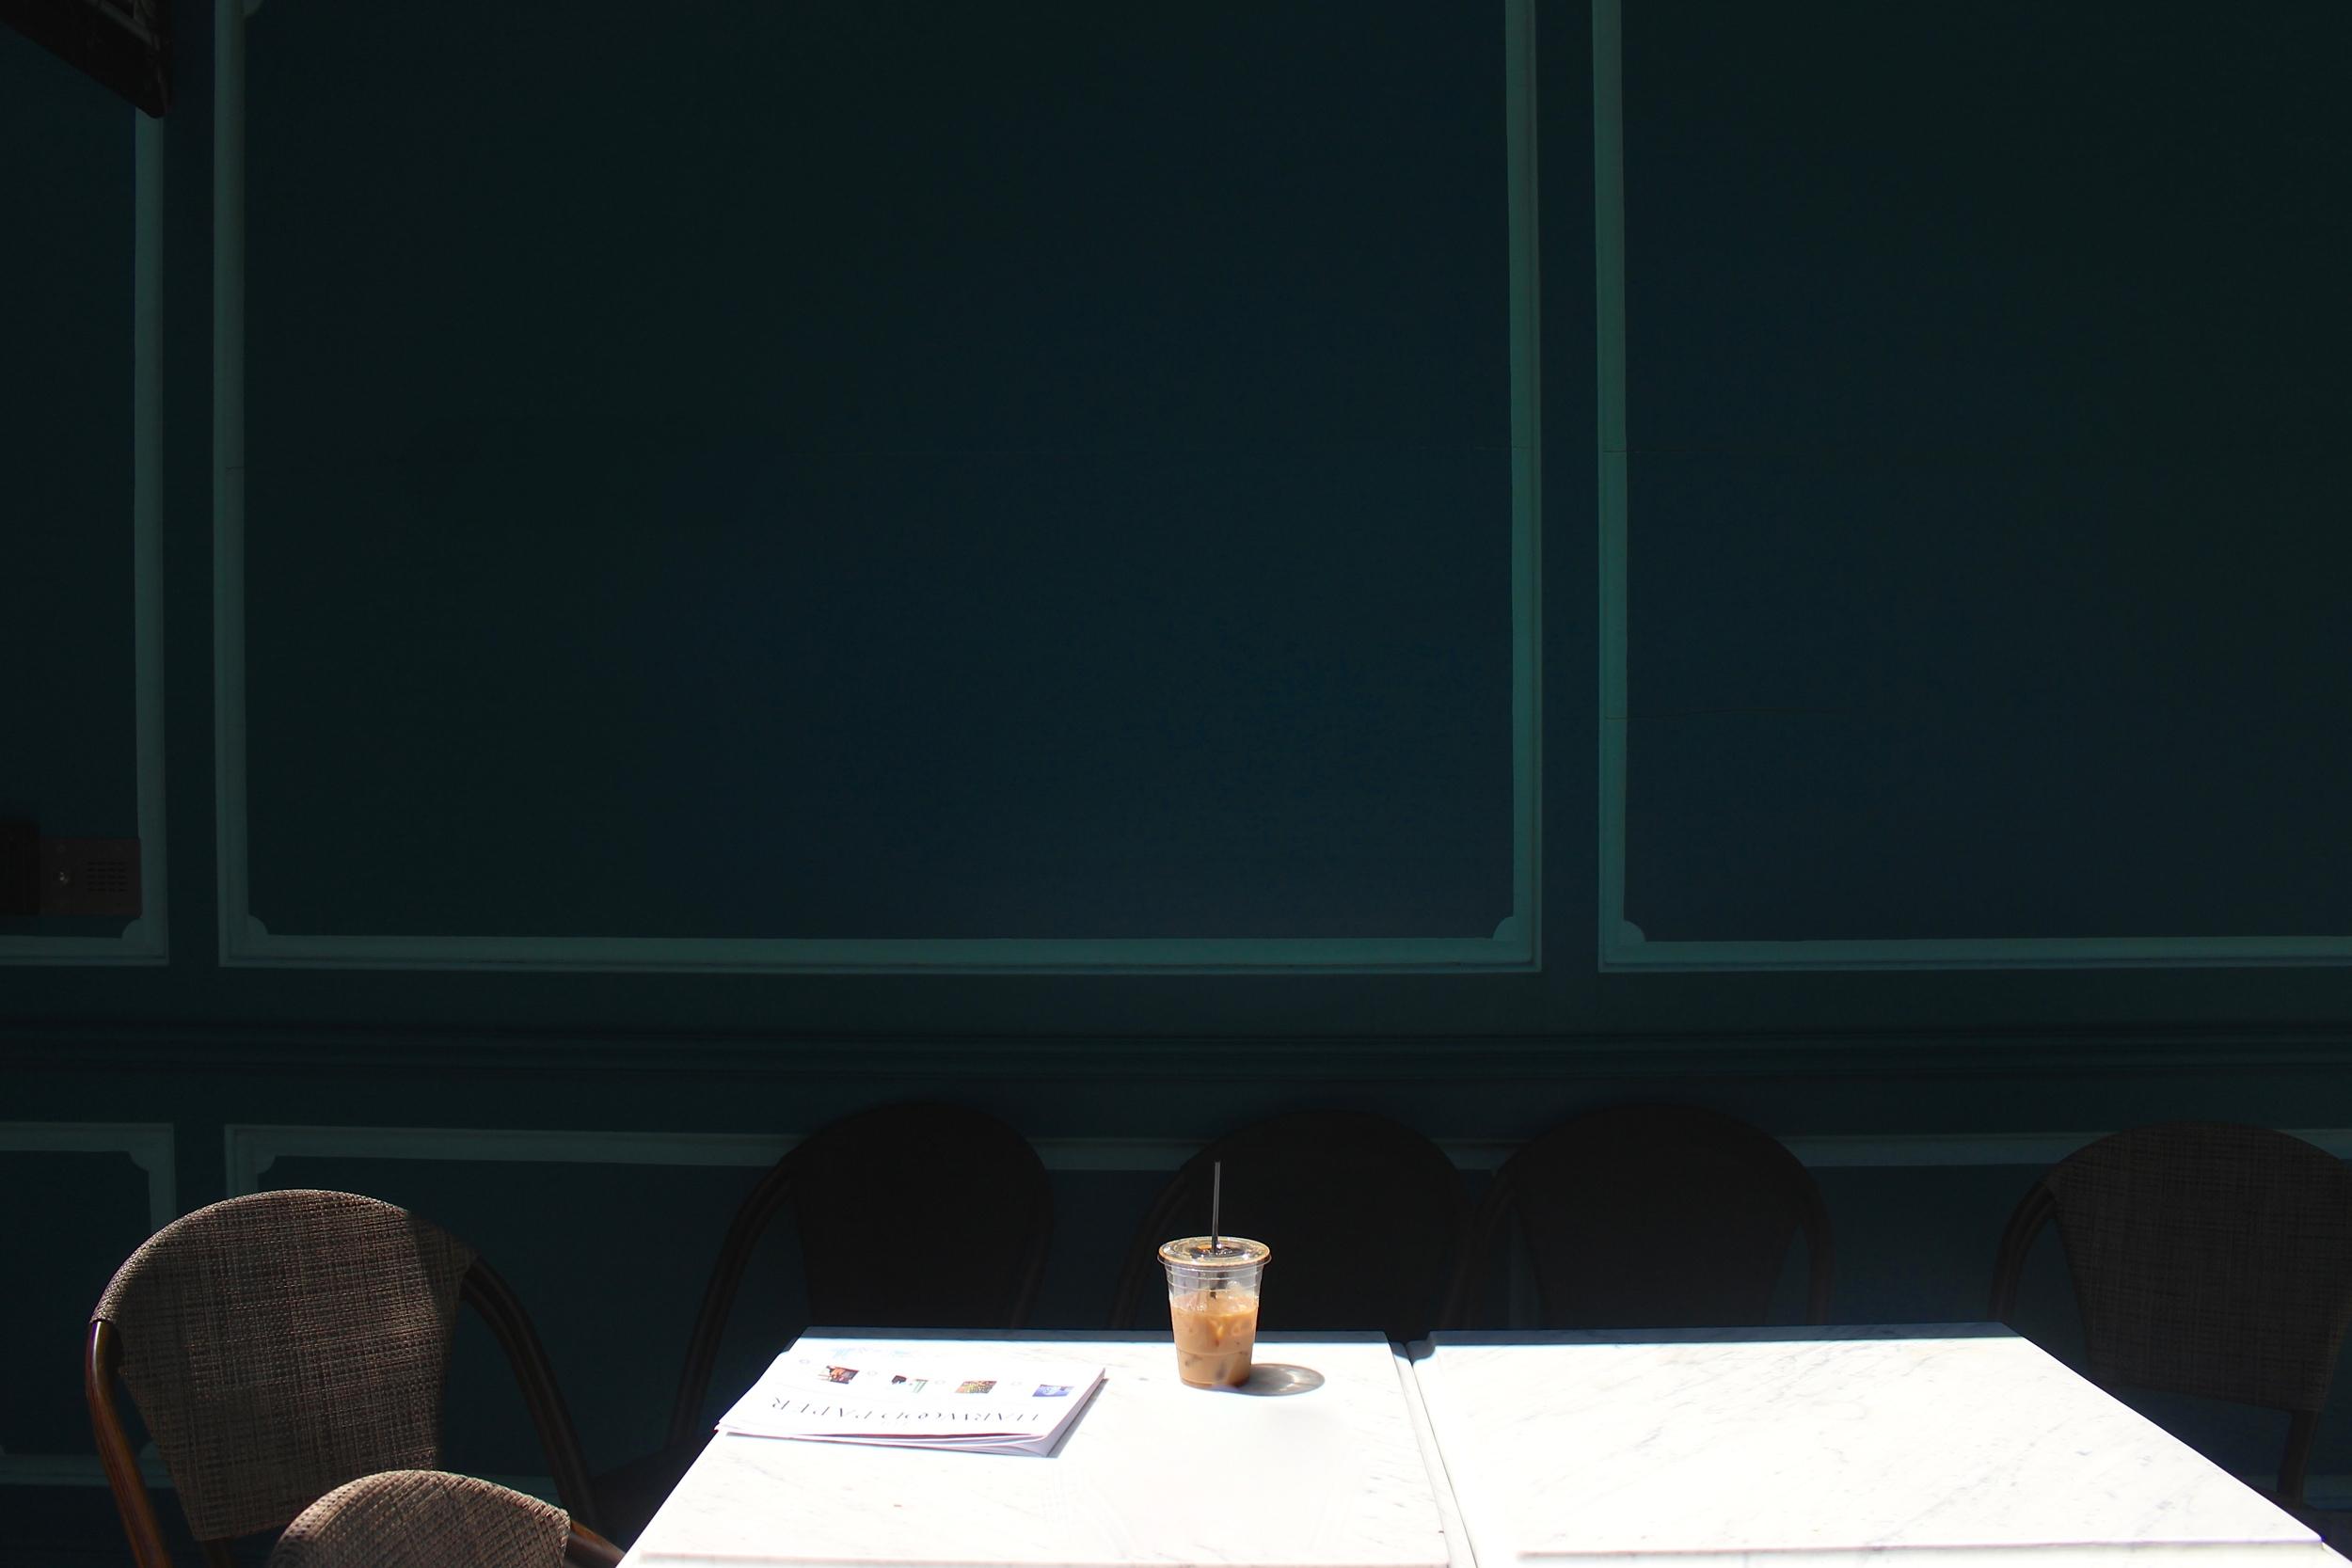 Magnolias sous le pont | Dallas coffee shop guide  by miami blogger Zeinab Kristen